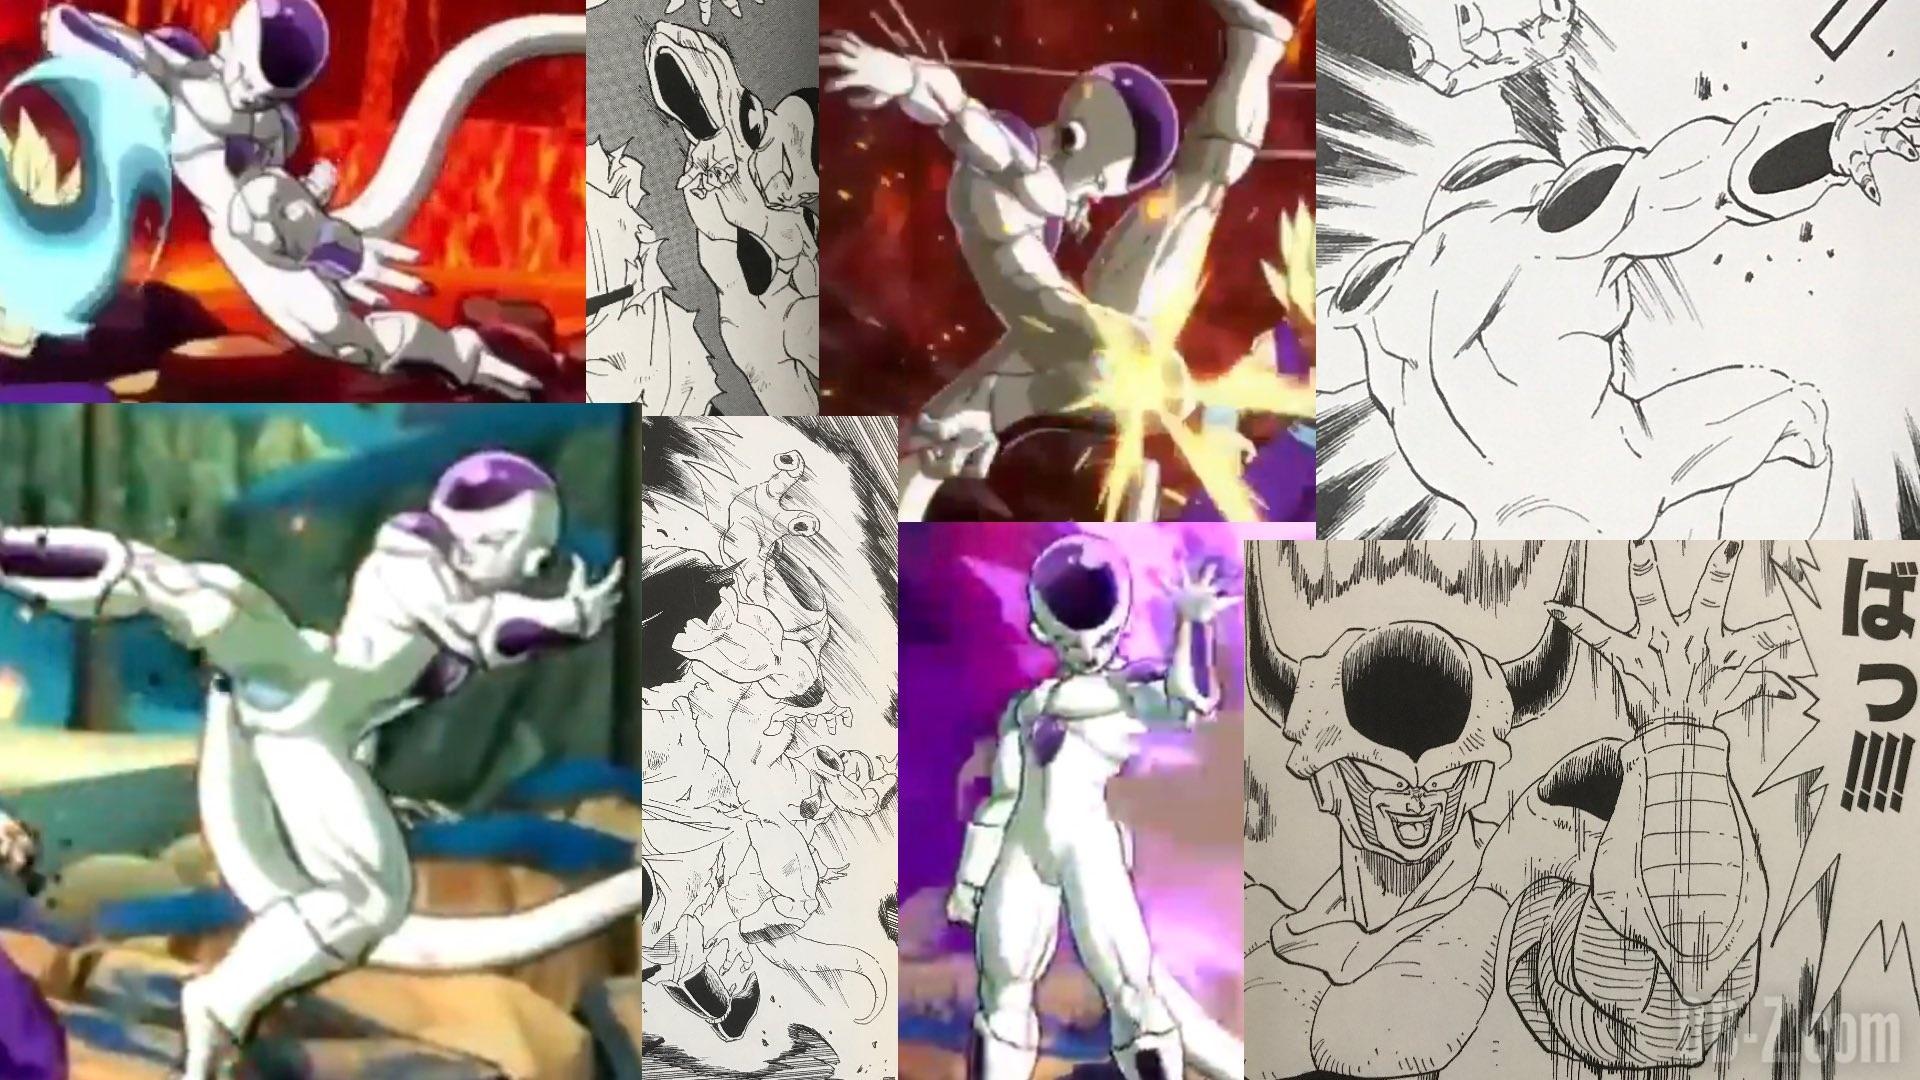 Dragon Wallpaper Hd For Pc Dragon Ball Fighterz Comparaison Avec Le Manga Dragon Ball